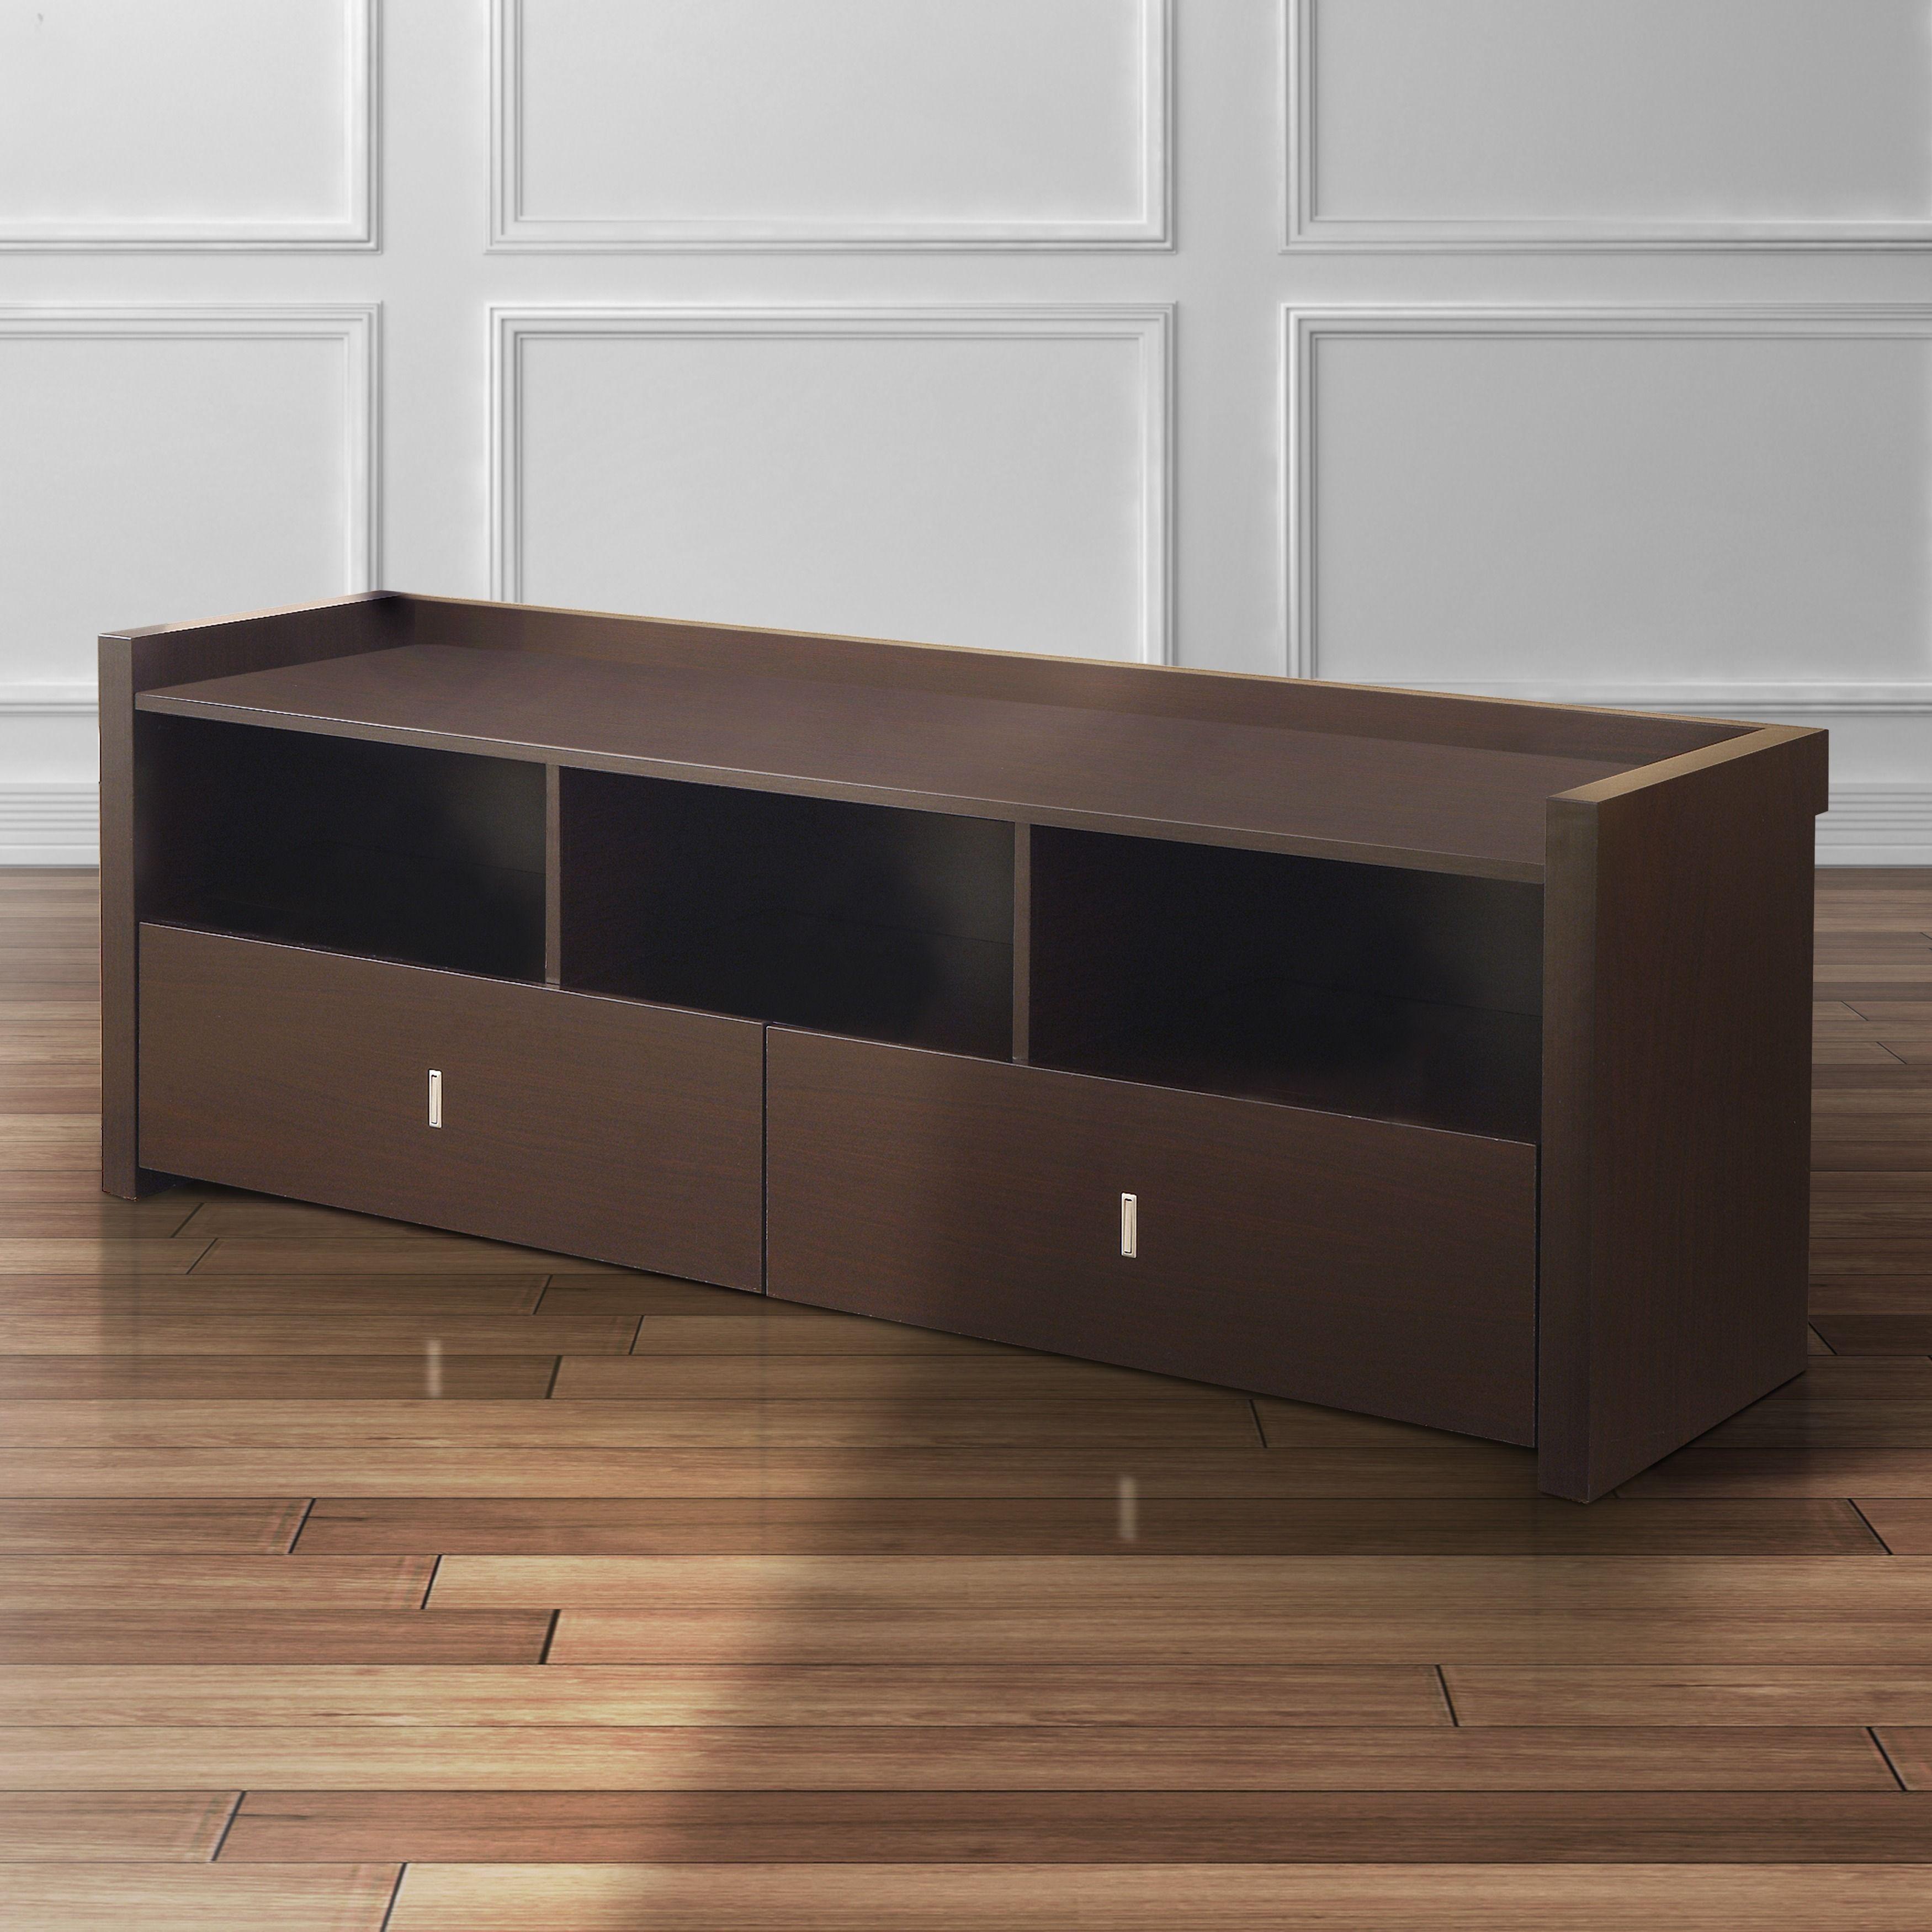 Furniture of America Valenciara Entertainment Console 60 inch